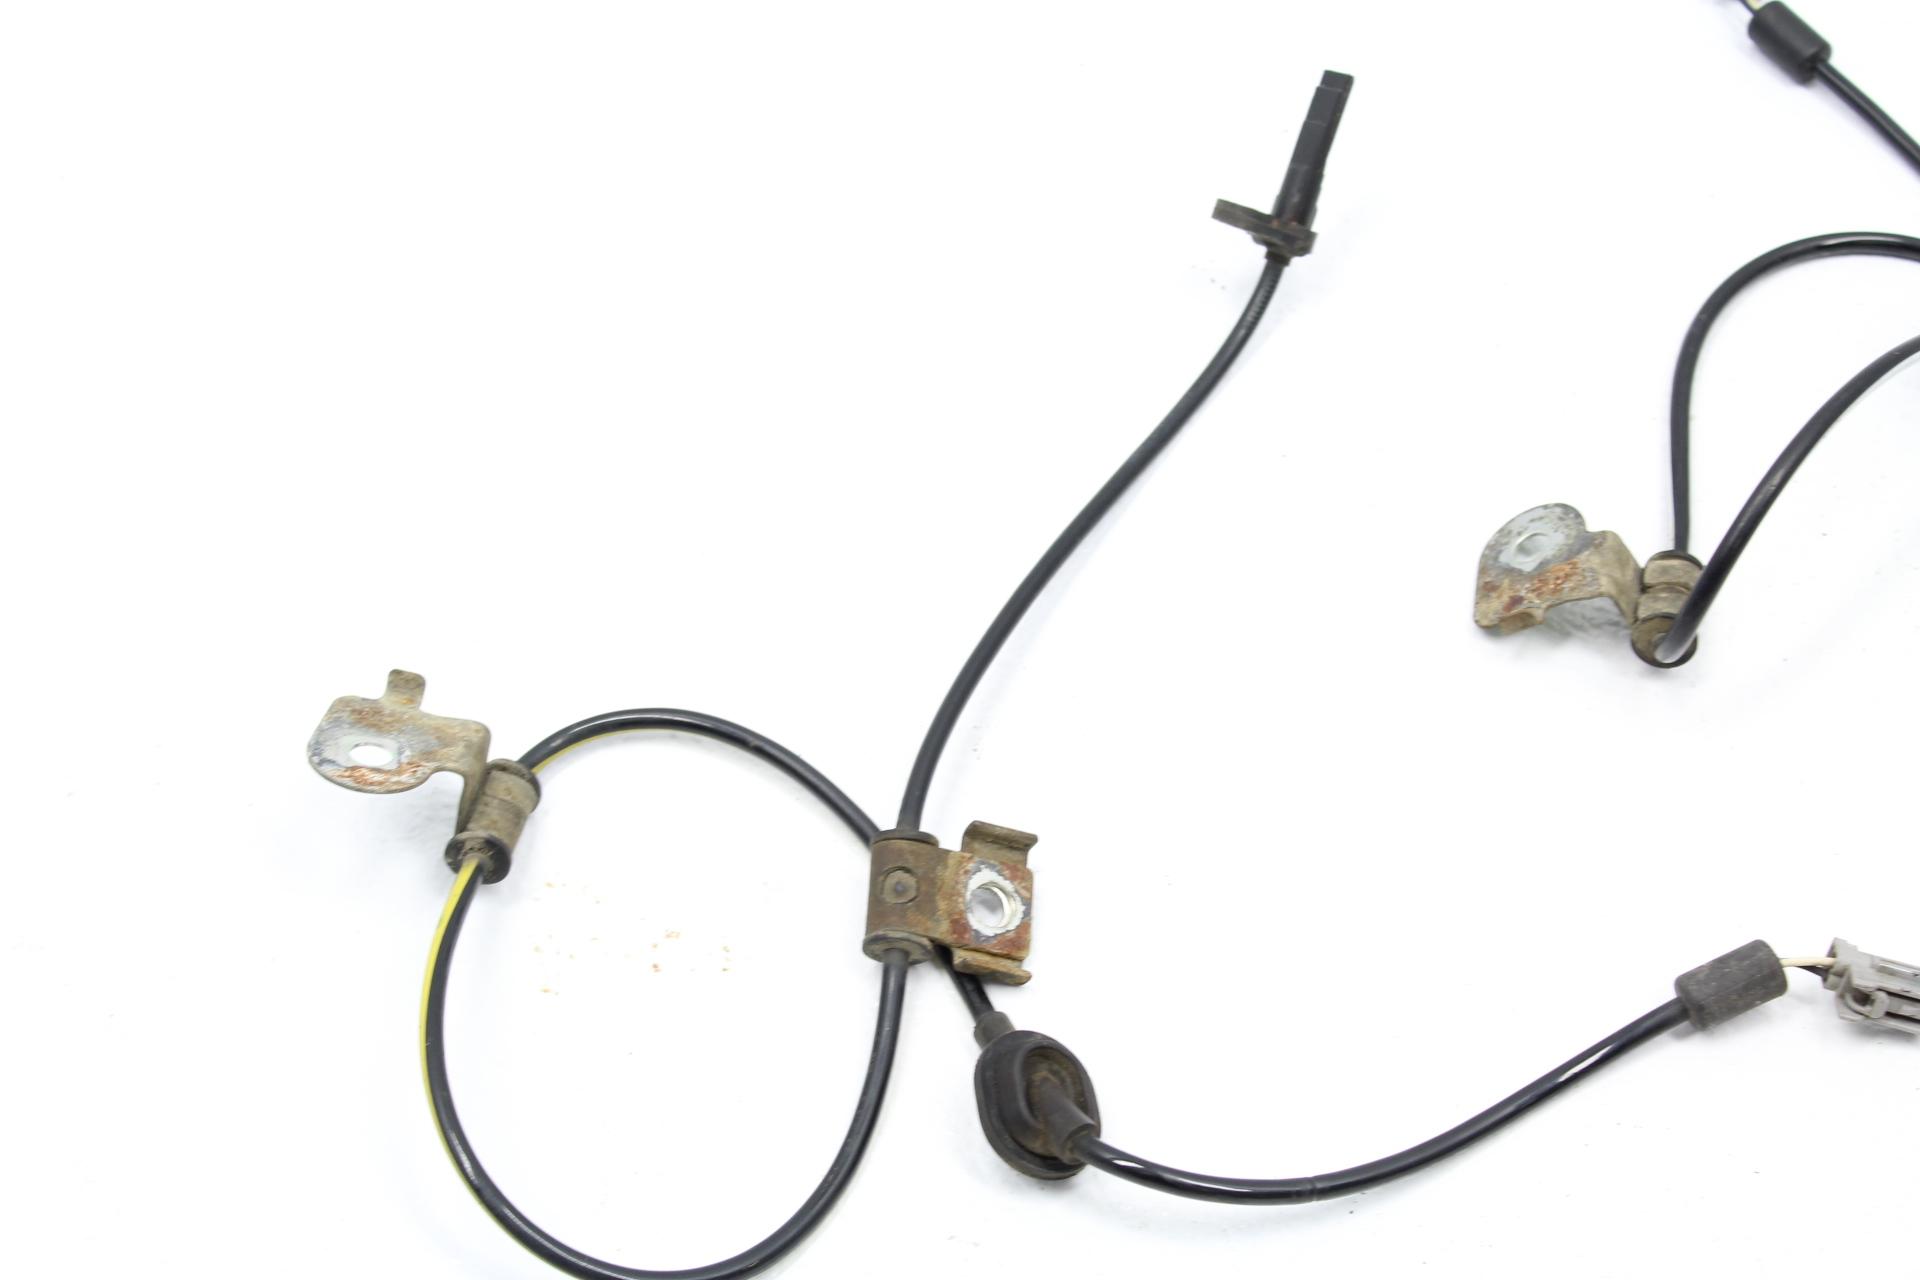 Subaru Wrx Sti Front Speed Abs Sensor Lh Rh